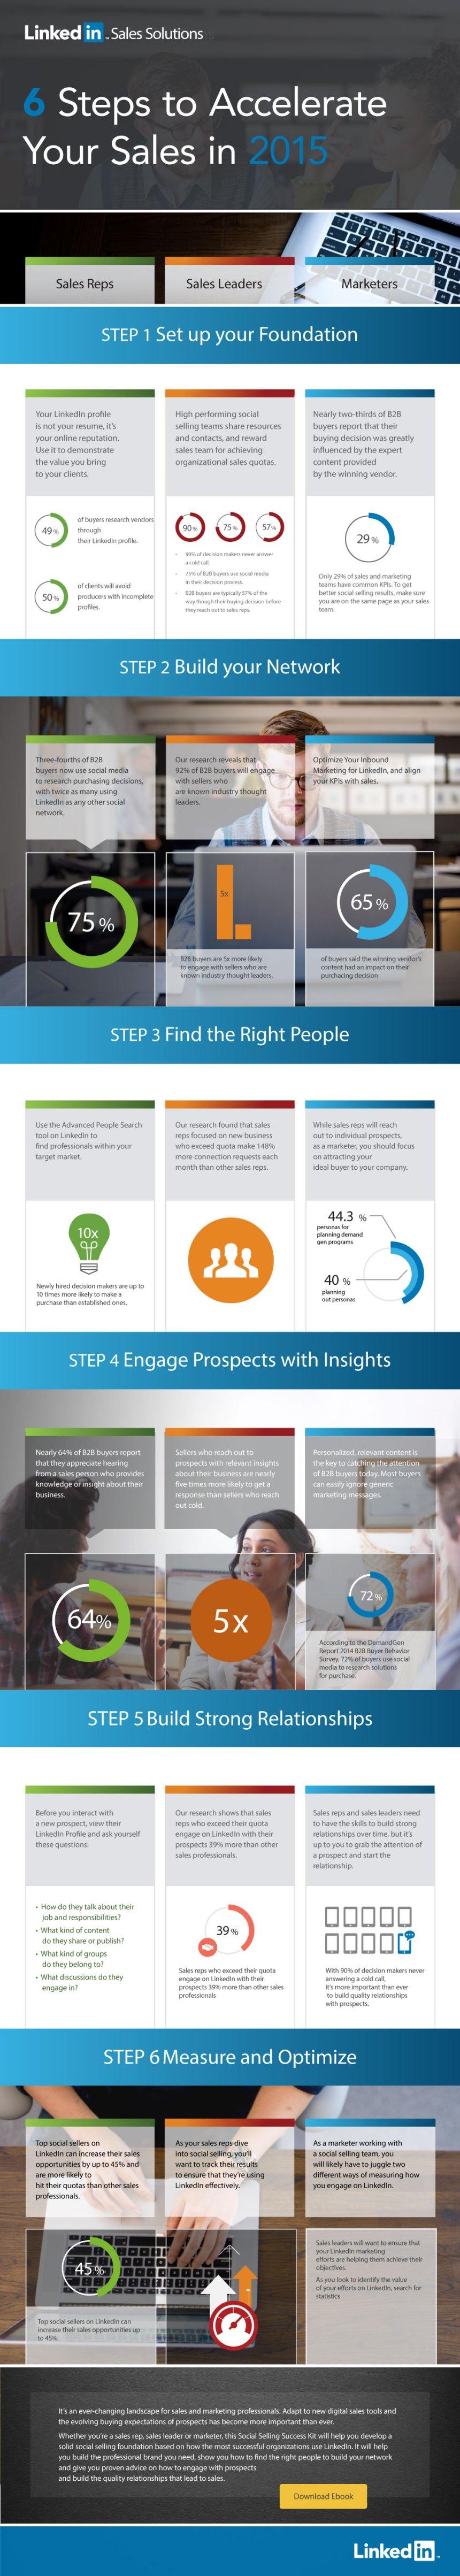 6 pasos para acelerar tus ventas: Linkedin sales solutions